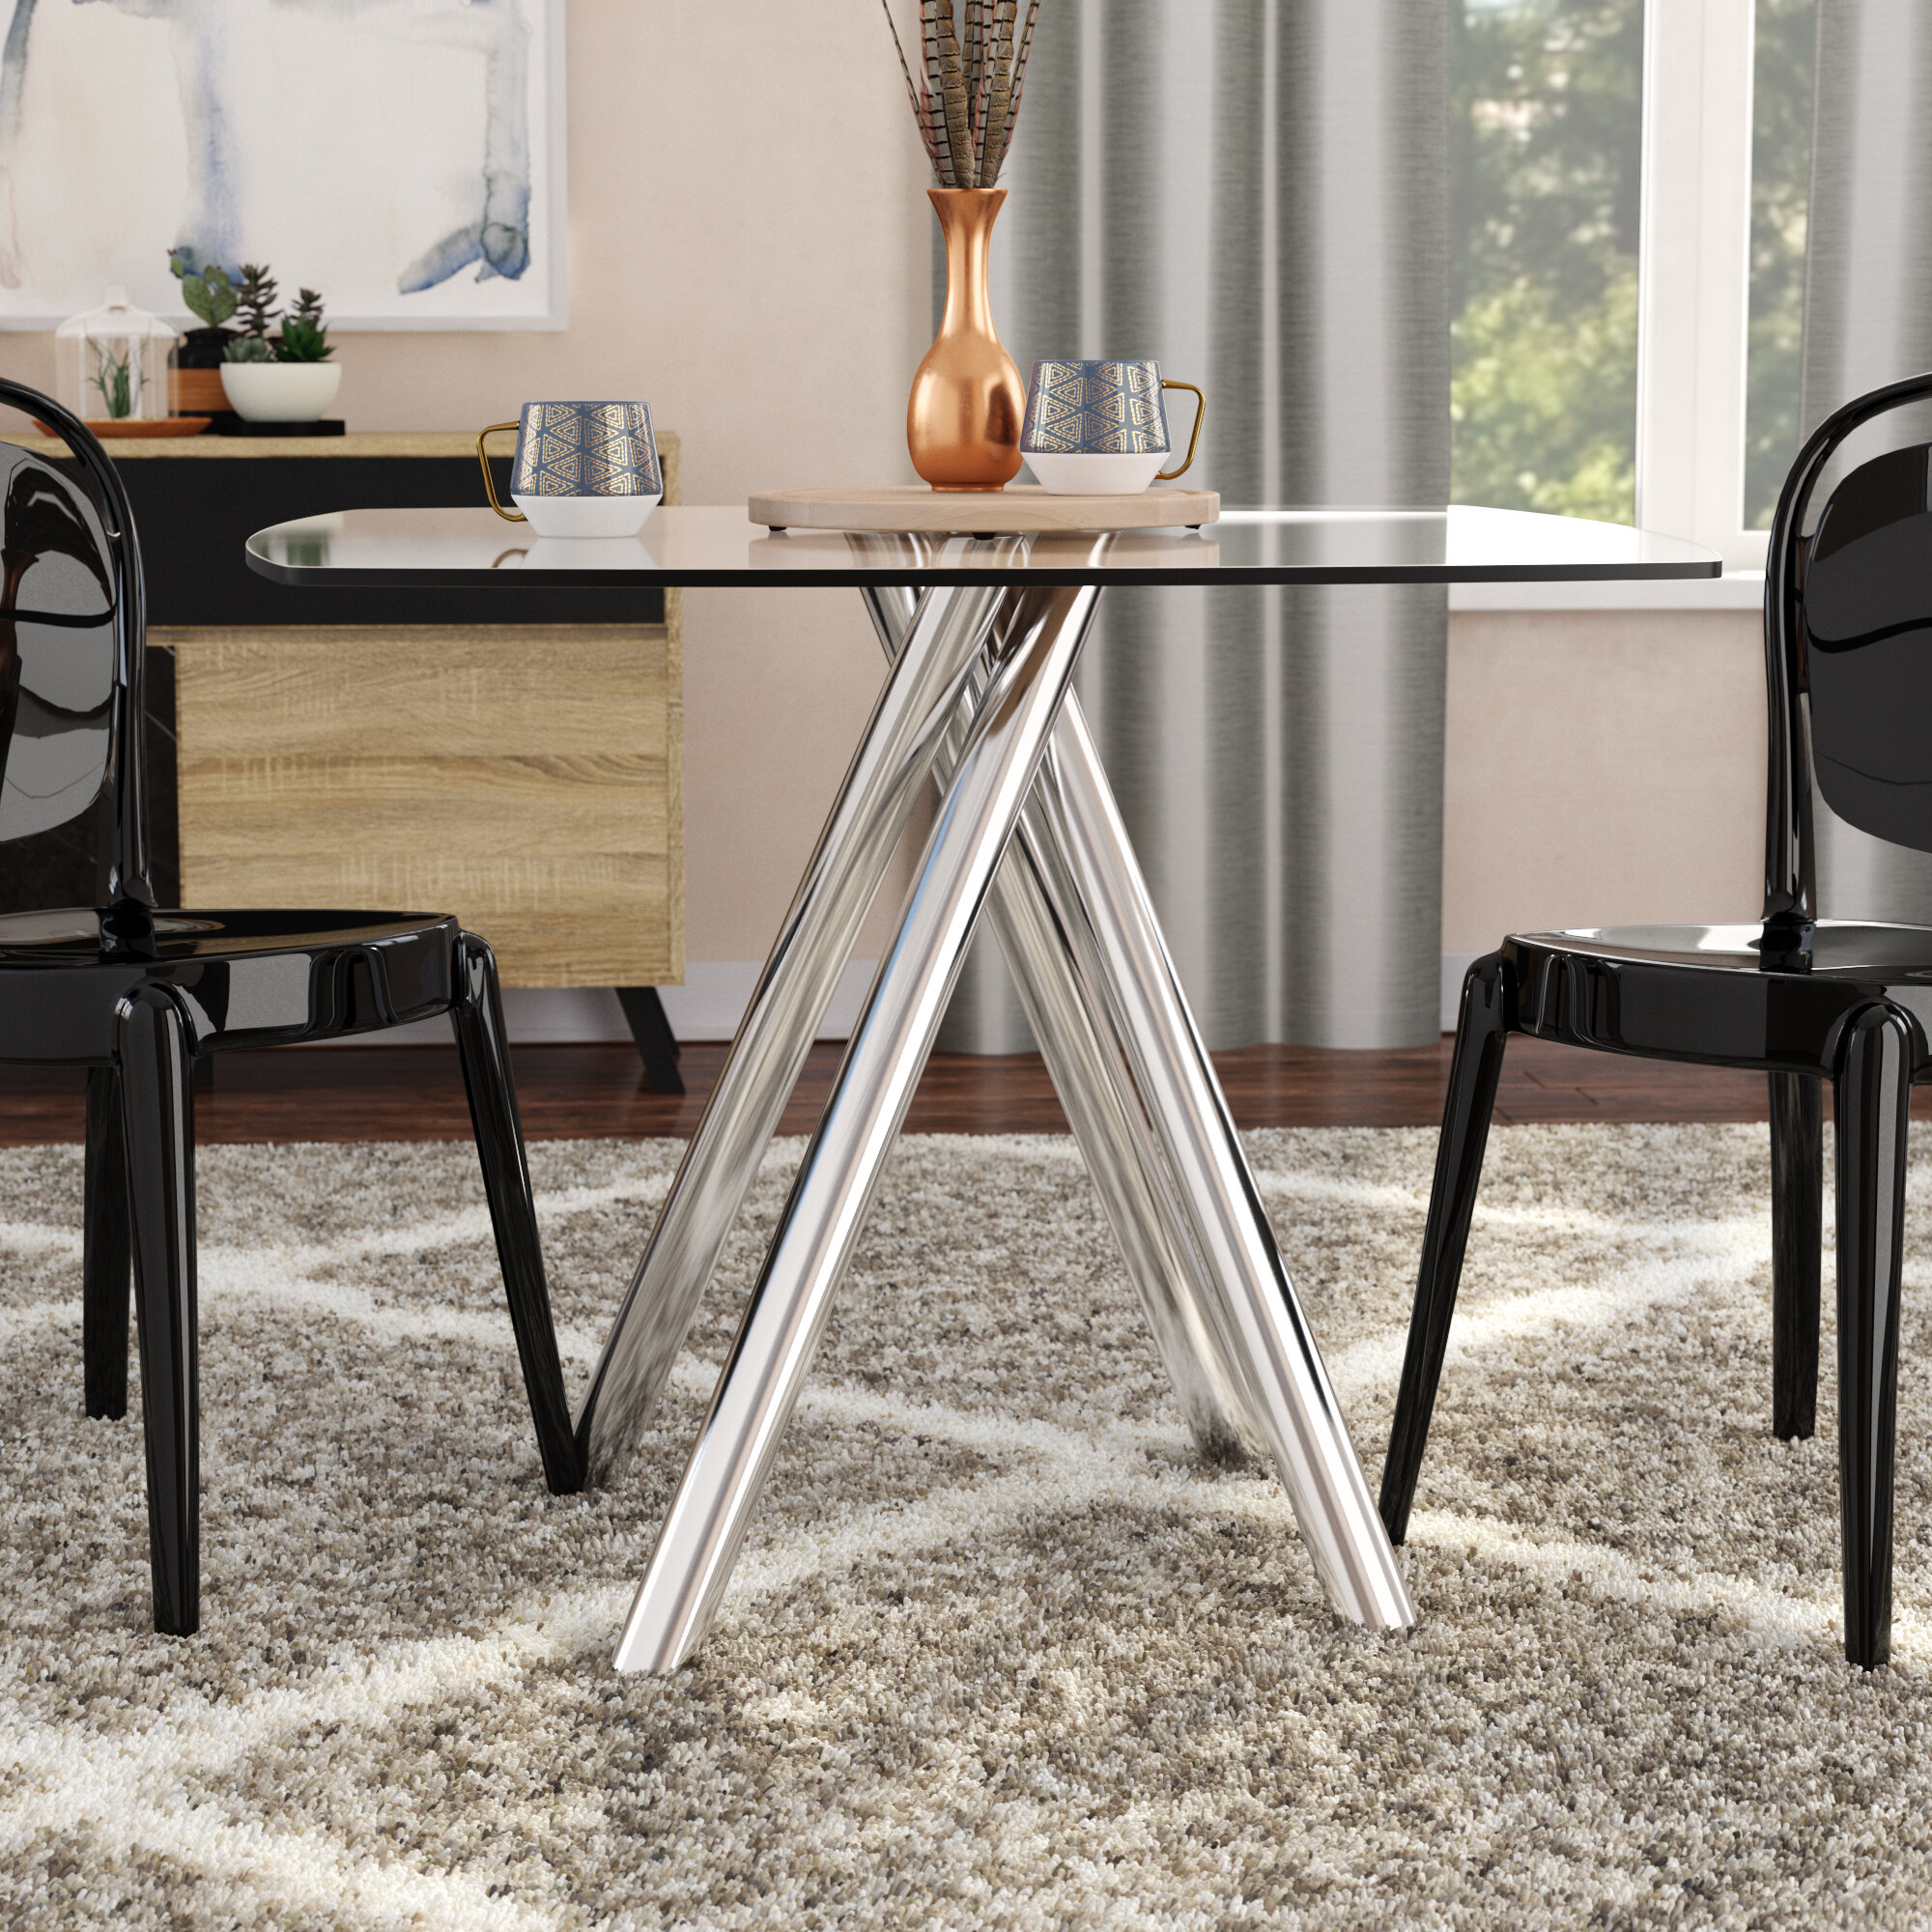 Sensational Huebner Dining Table Download Free Architecture Designs Salvmadebymaigaardcom